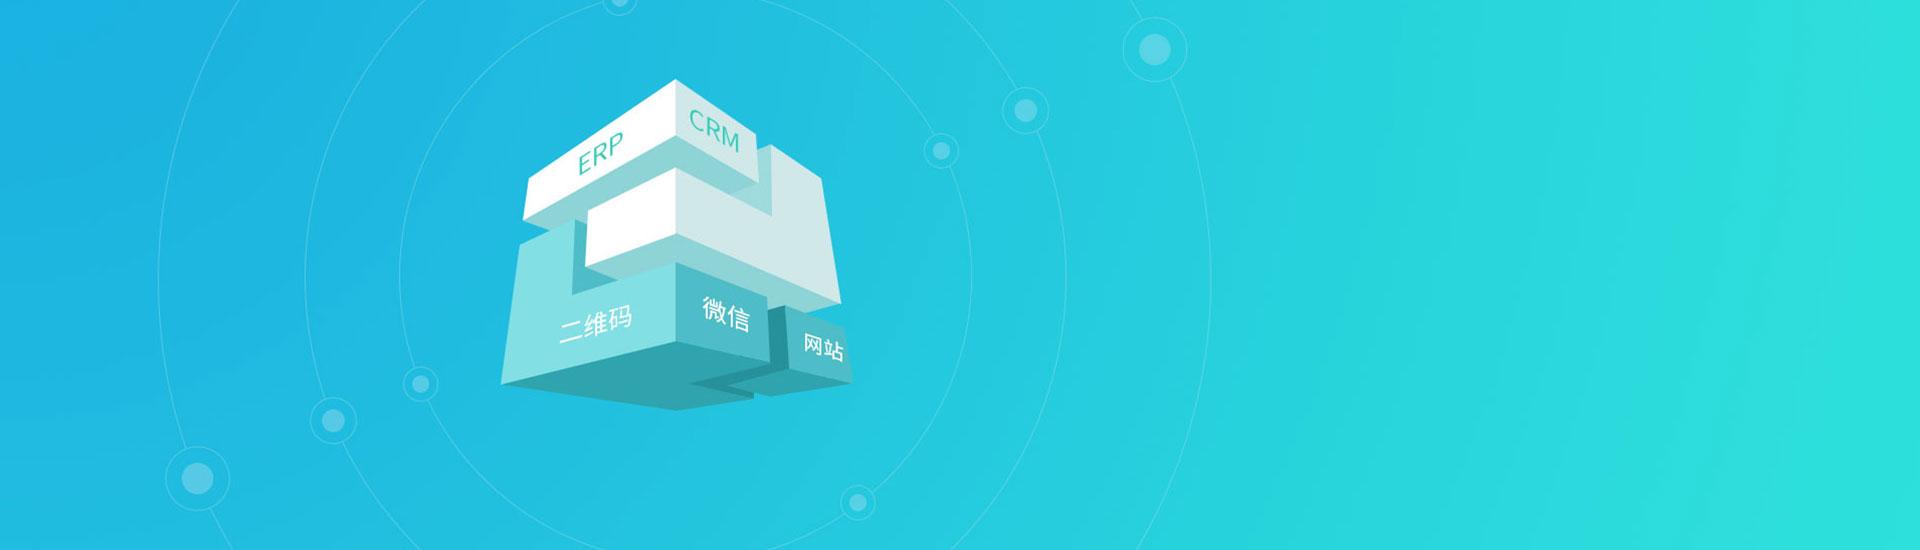 MetInfo, The creative factory of Enterprise website